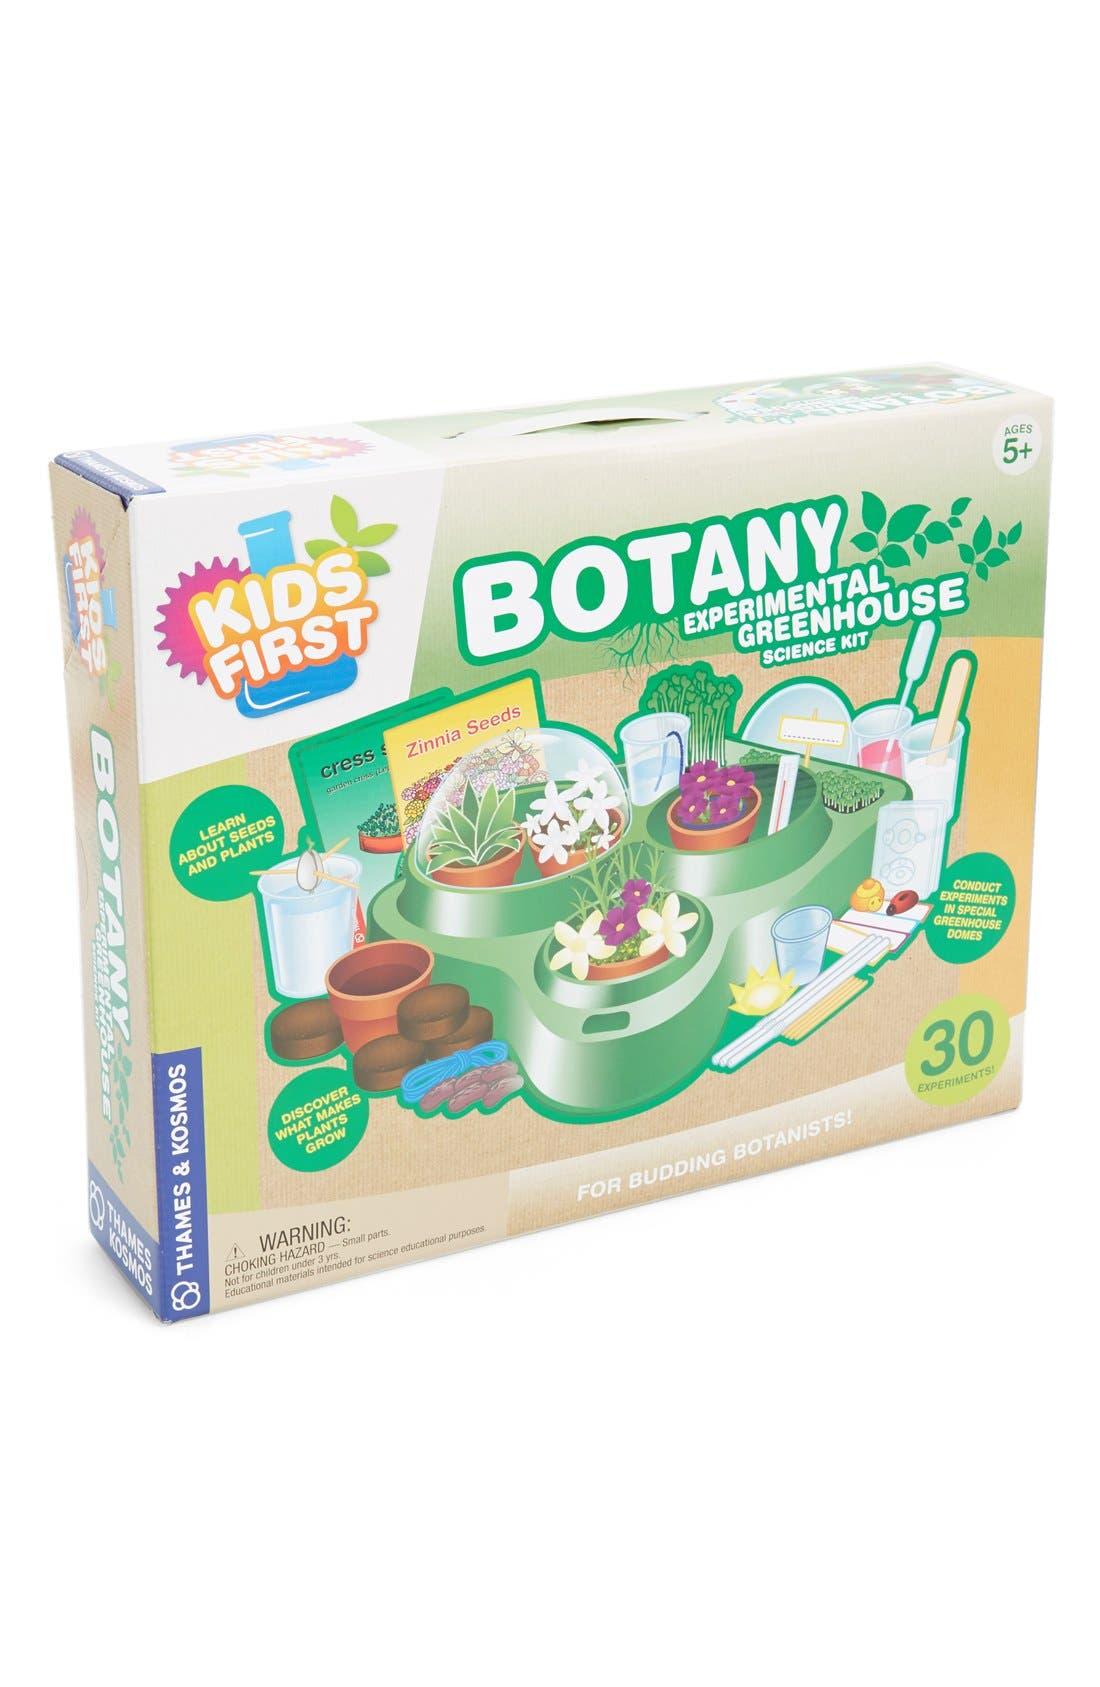 Thames & Kosmos Botany Experimental Greenhouse Science Kit